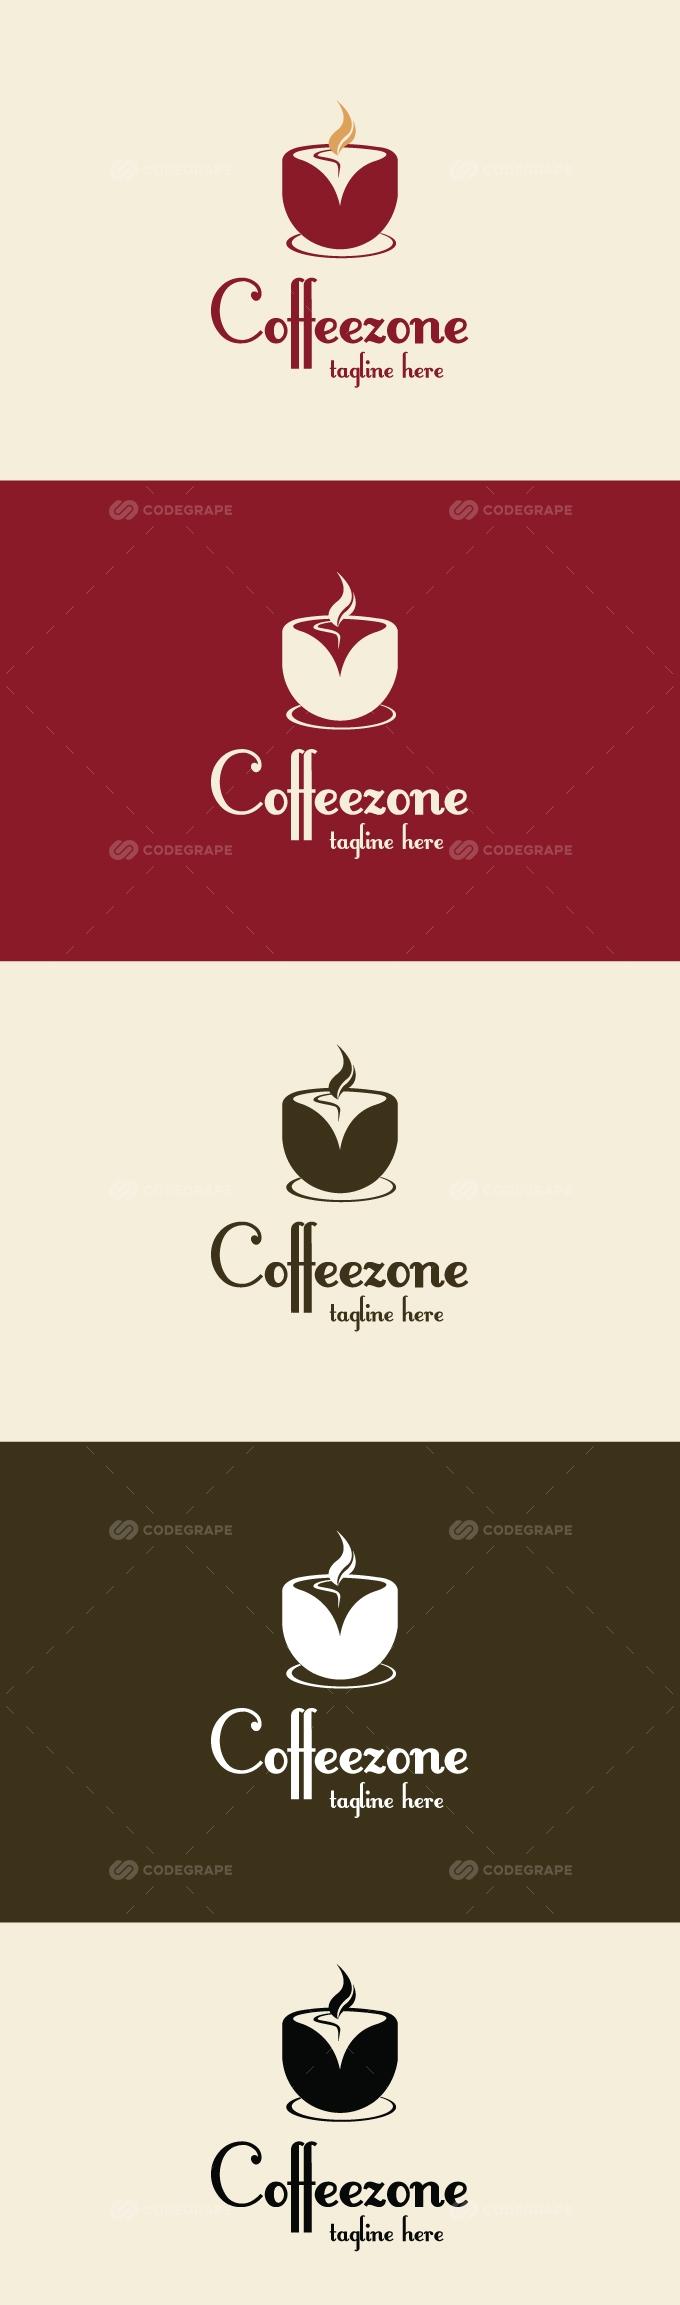 Coffee zone Logo (Restaurant)